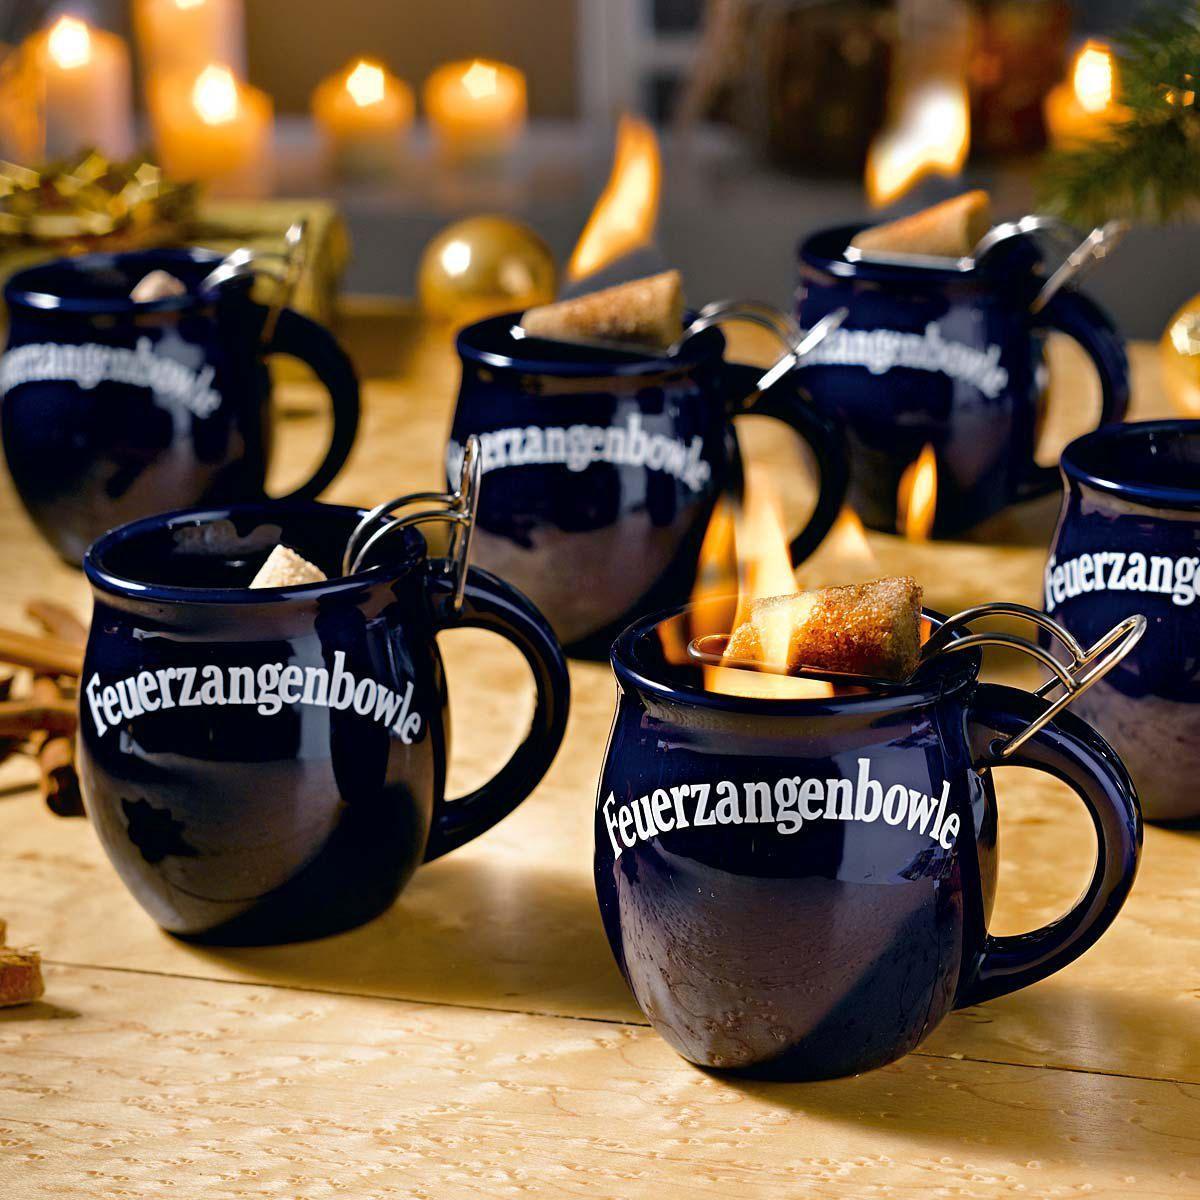 Geschenkset Feuerzangenbowle, 2 Tassen, Glühwein, Zimt